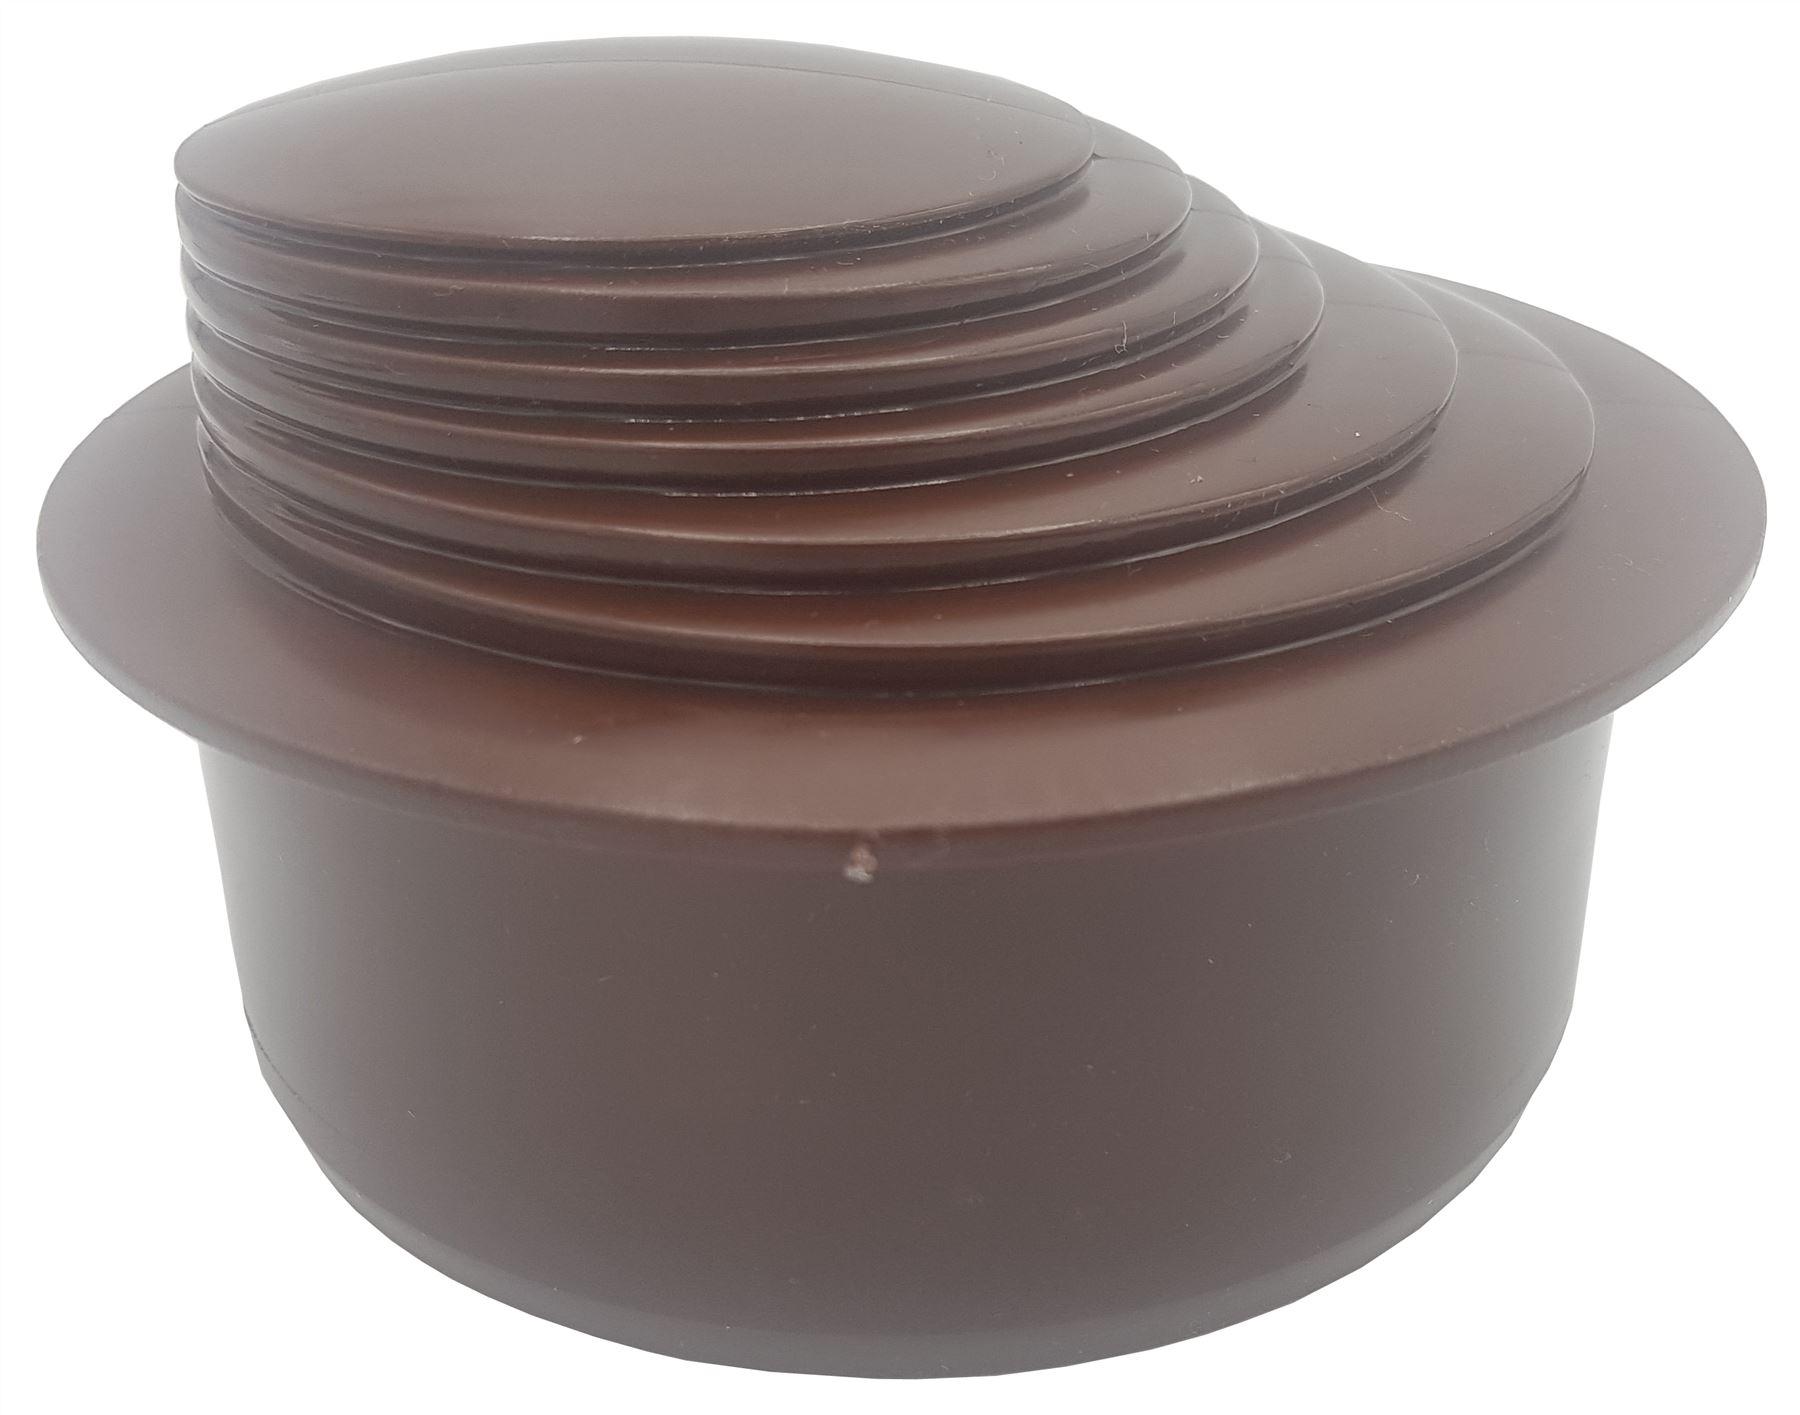 tuyau de descente de goutti re downpipe raccords r ducteur 110mm de goutti res ebay. Black Bedroom Furniture Sets. Home Design Ideas